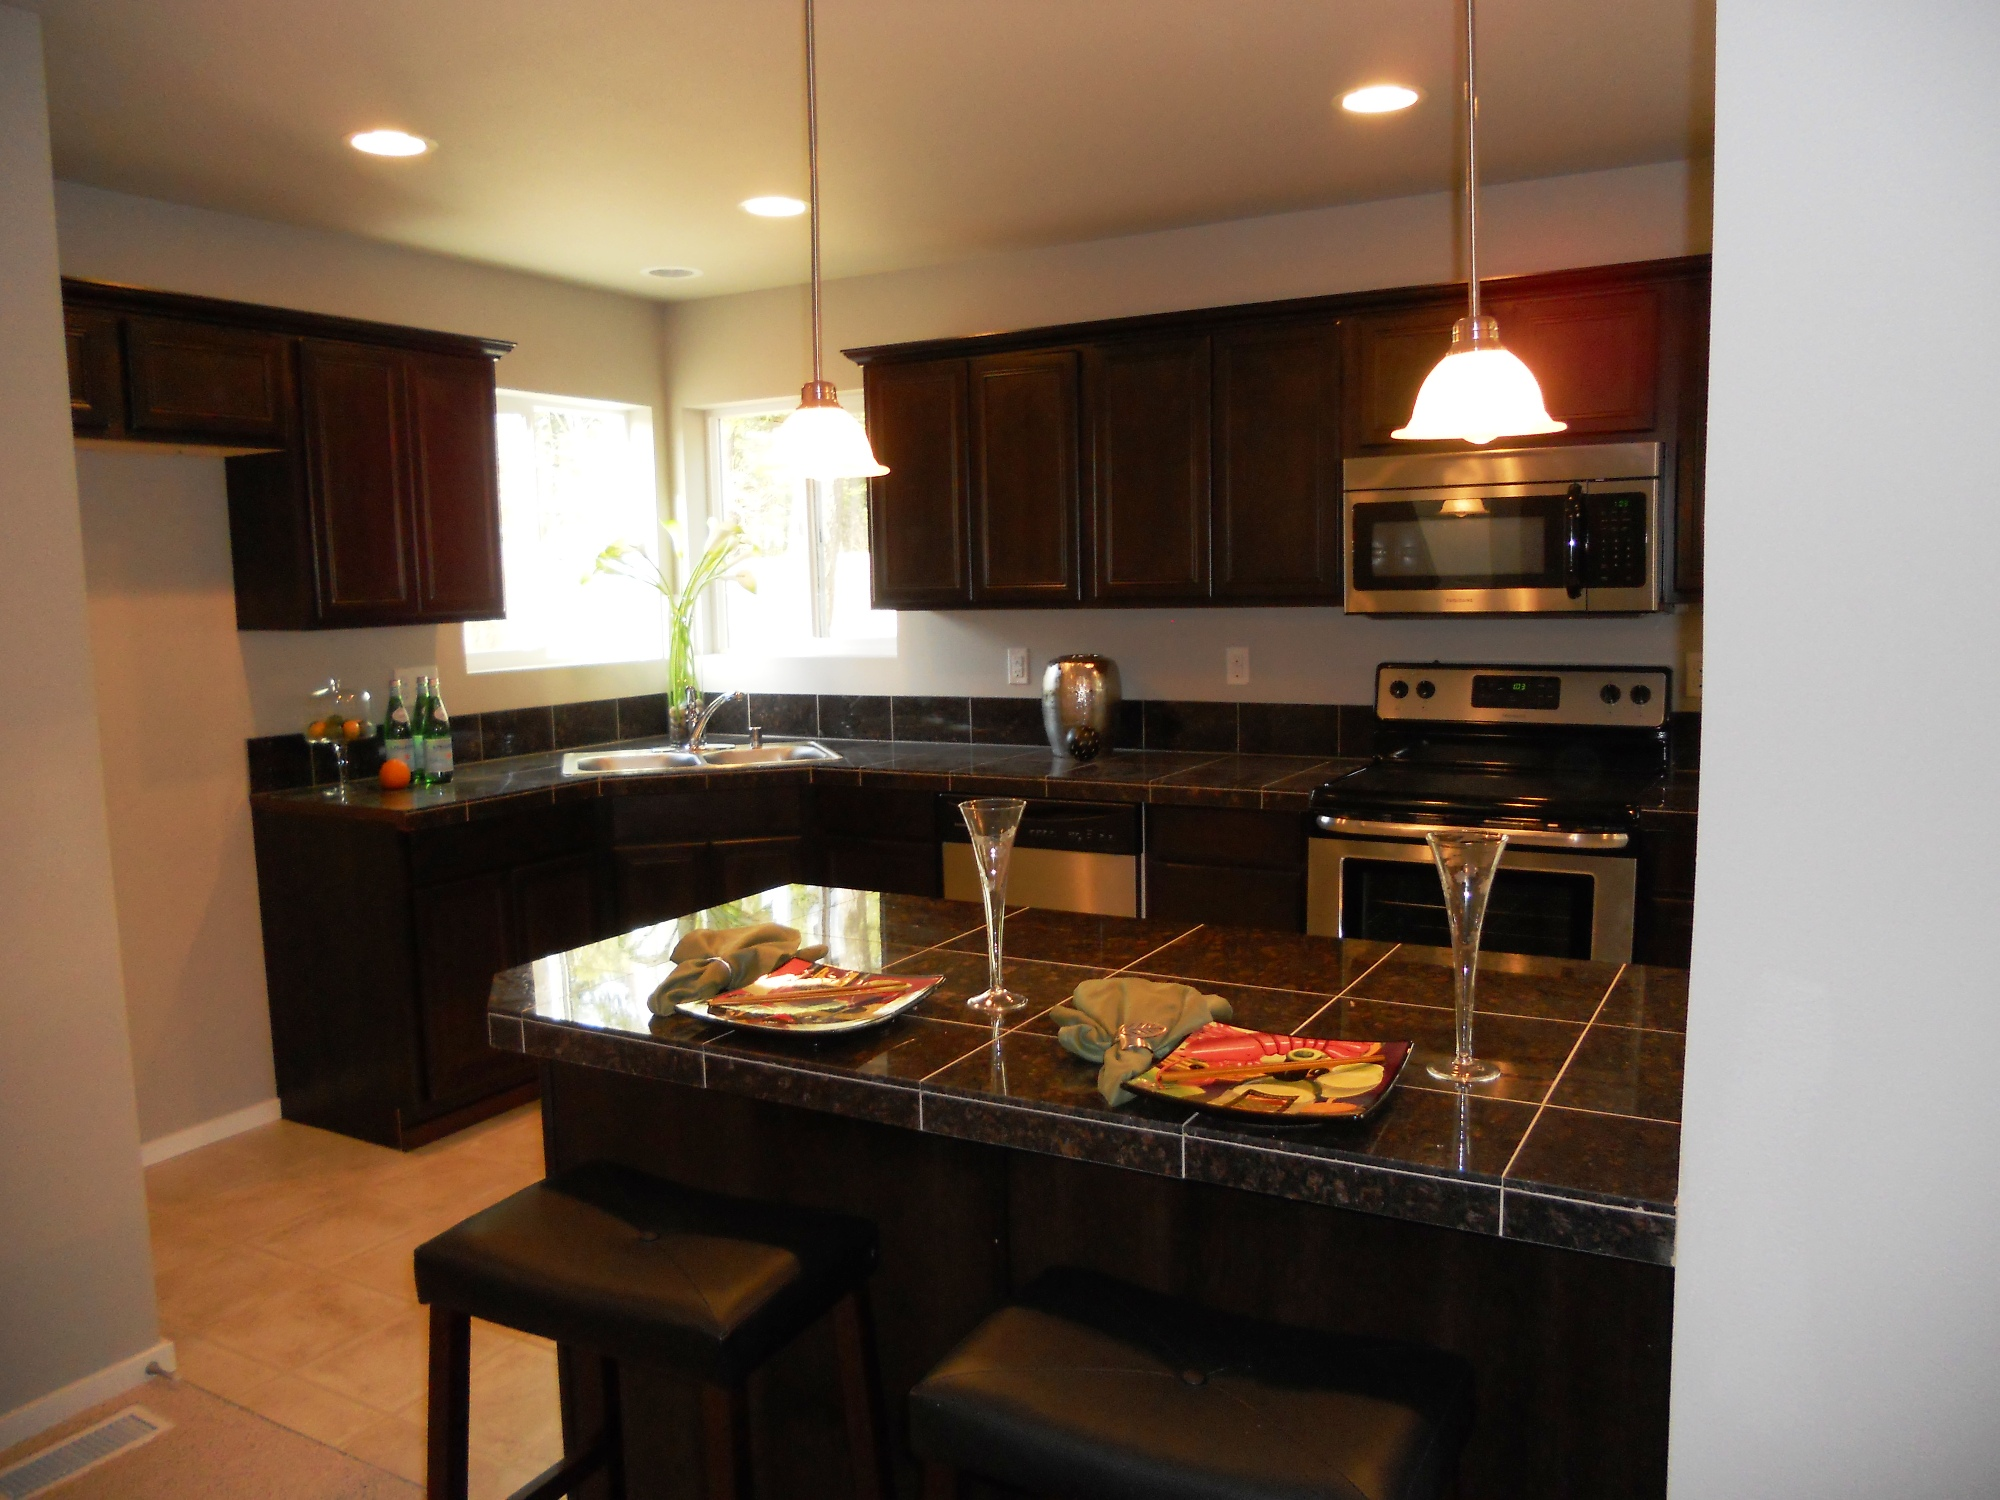 25 Beautiful Latest Model Kitchen Designs - HOME DECOR NEWS on Model Kitchen Ideas  id=47568